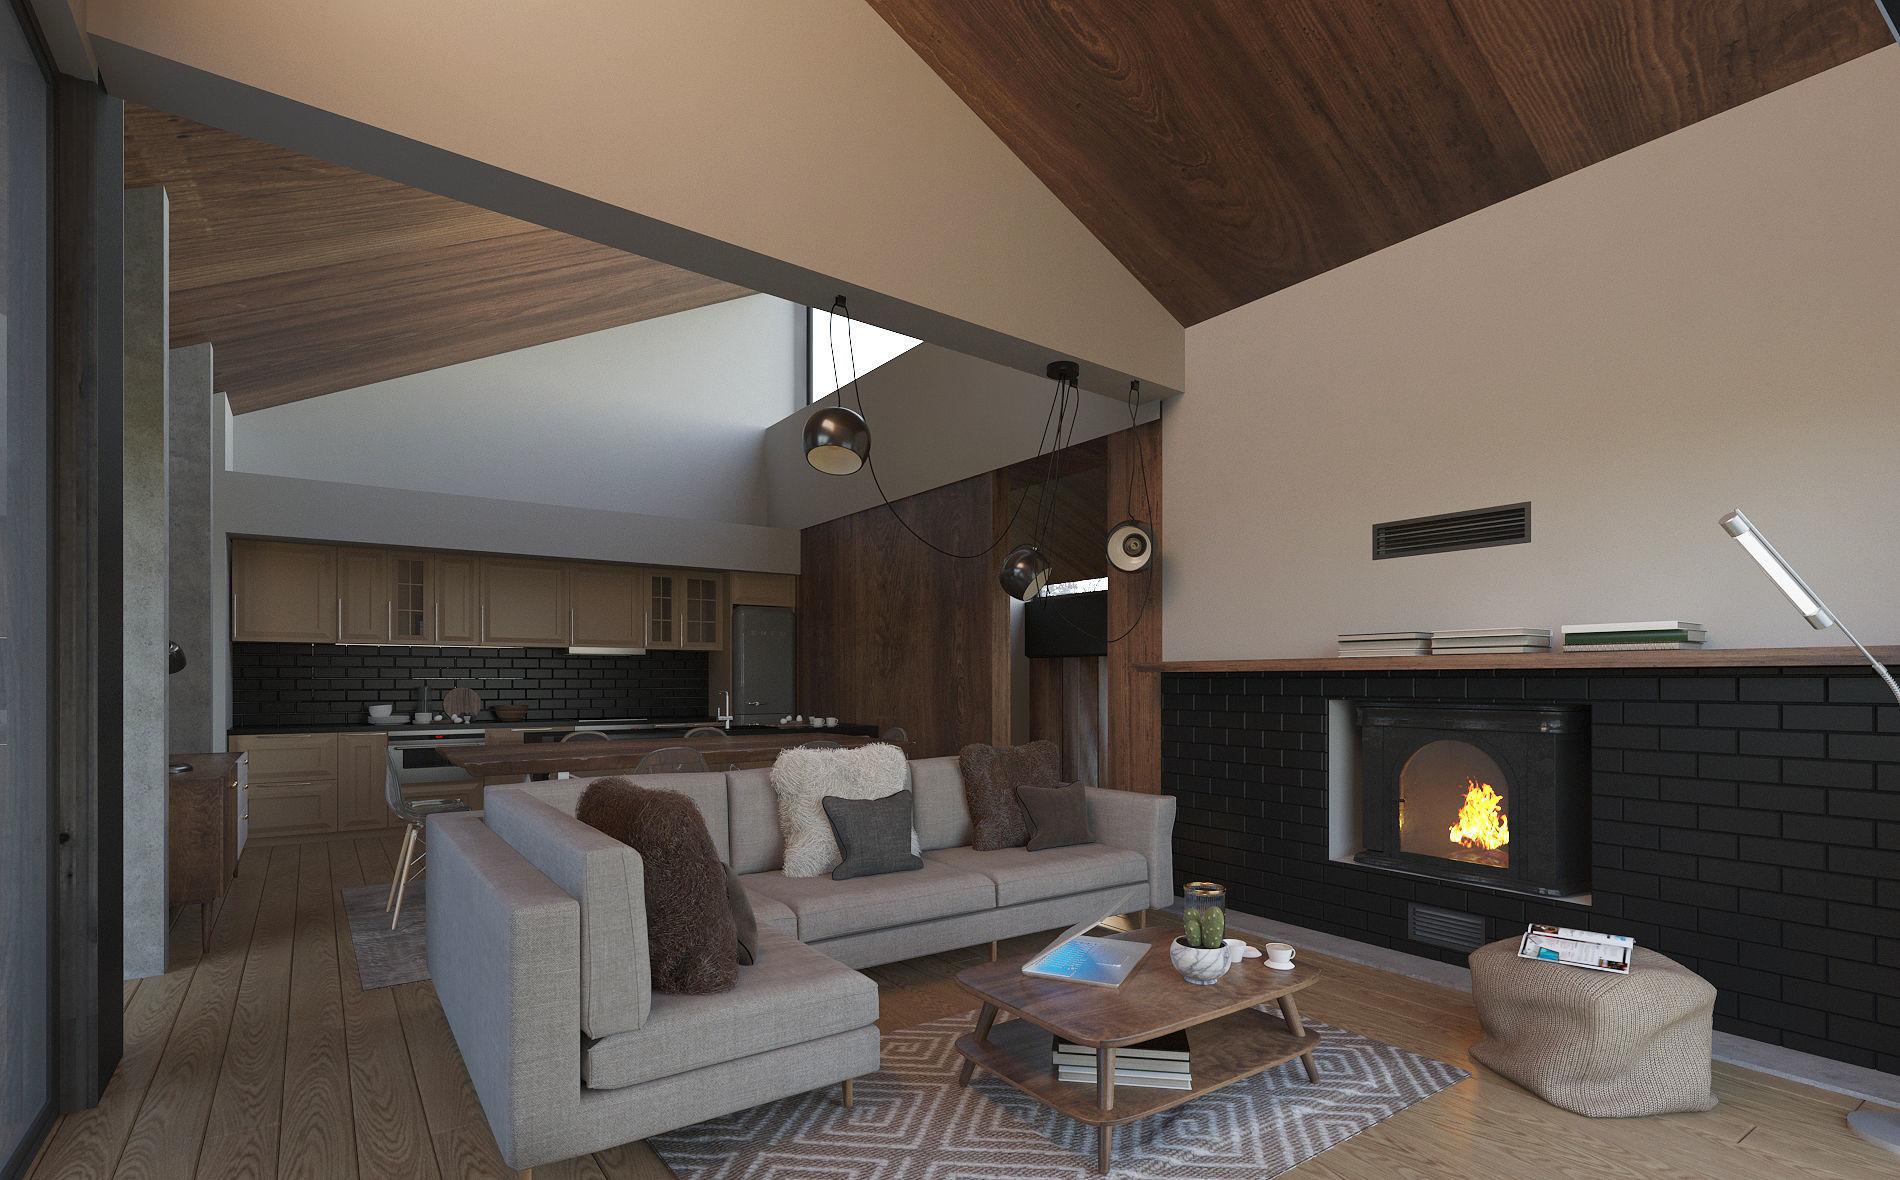 Winter Cabin House 2